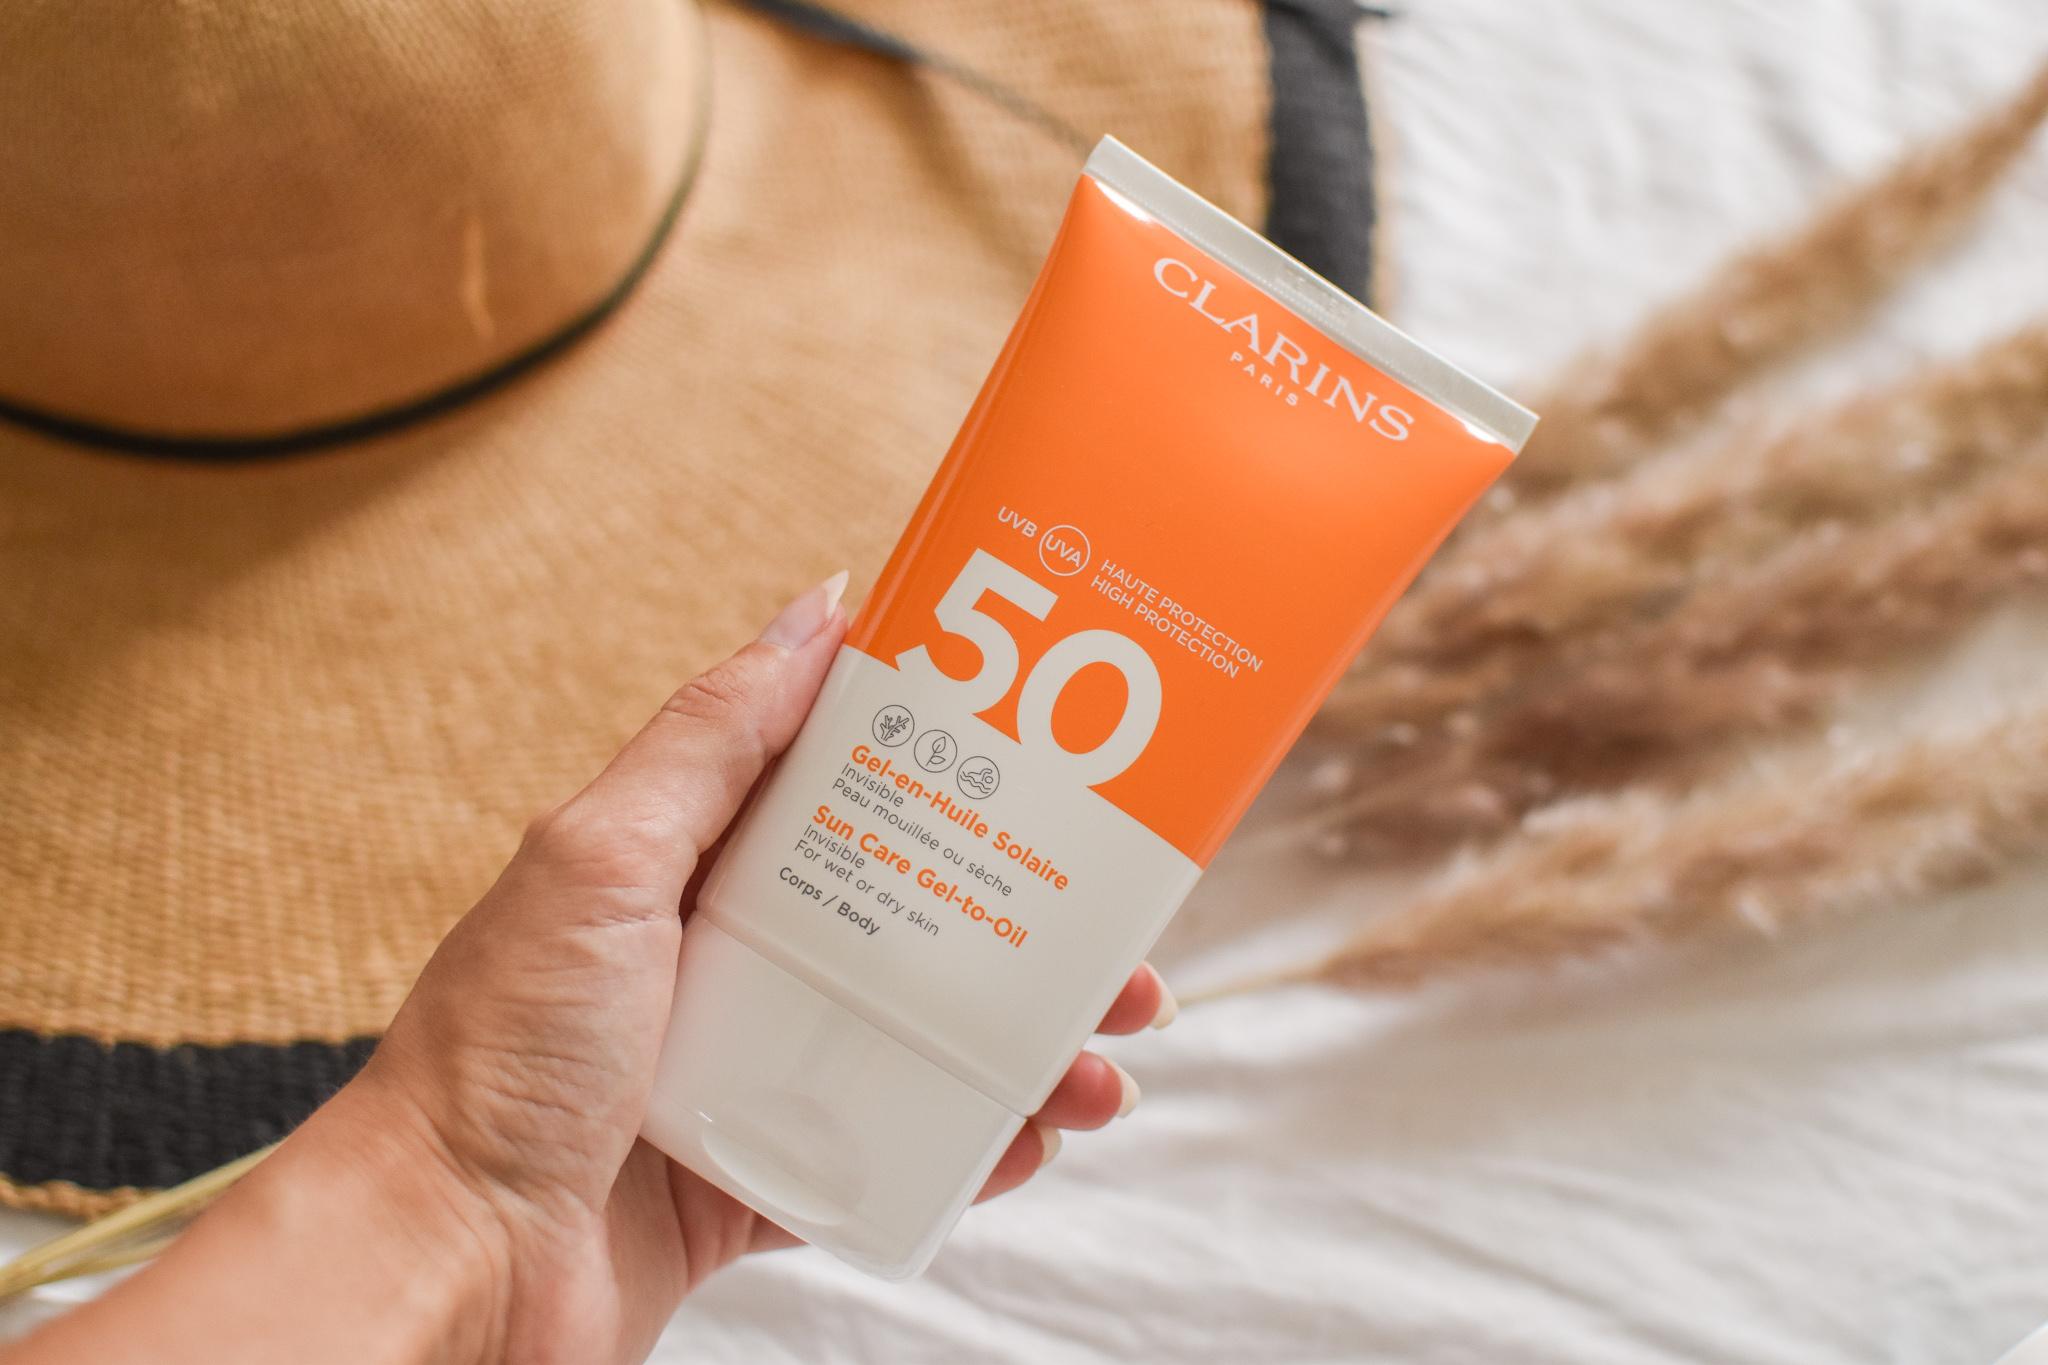 Clarins - Sun Care Gel-to-Oil Body SPF50+